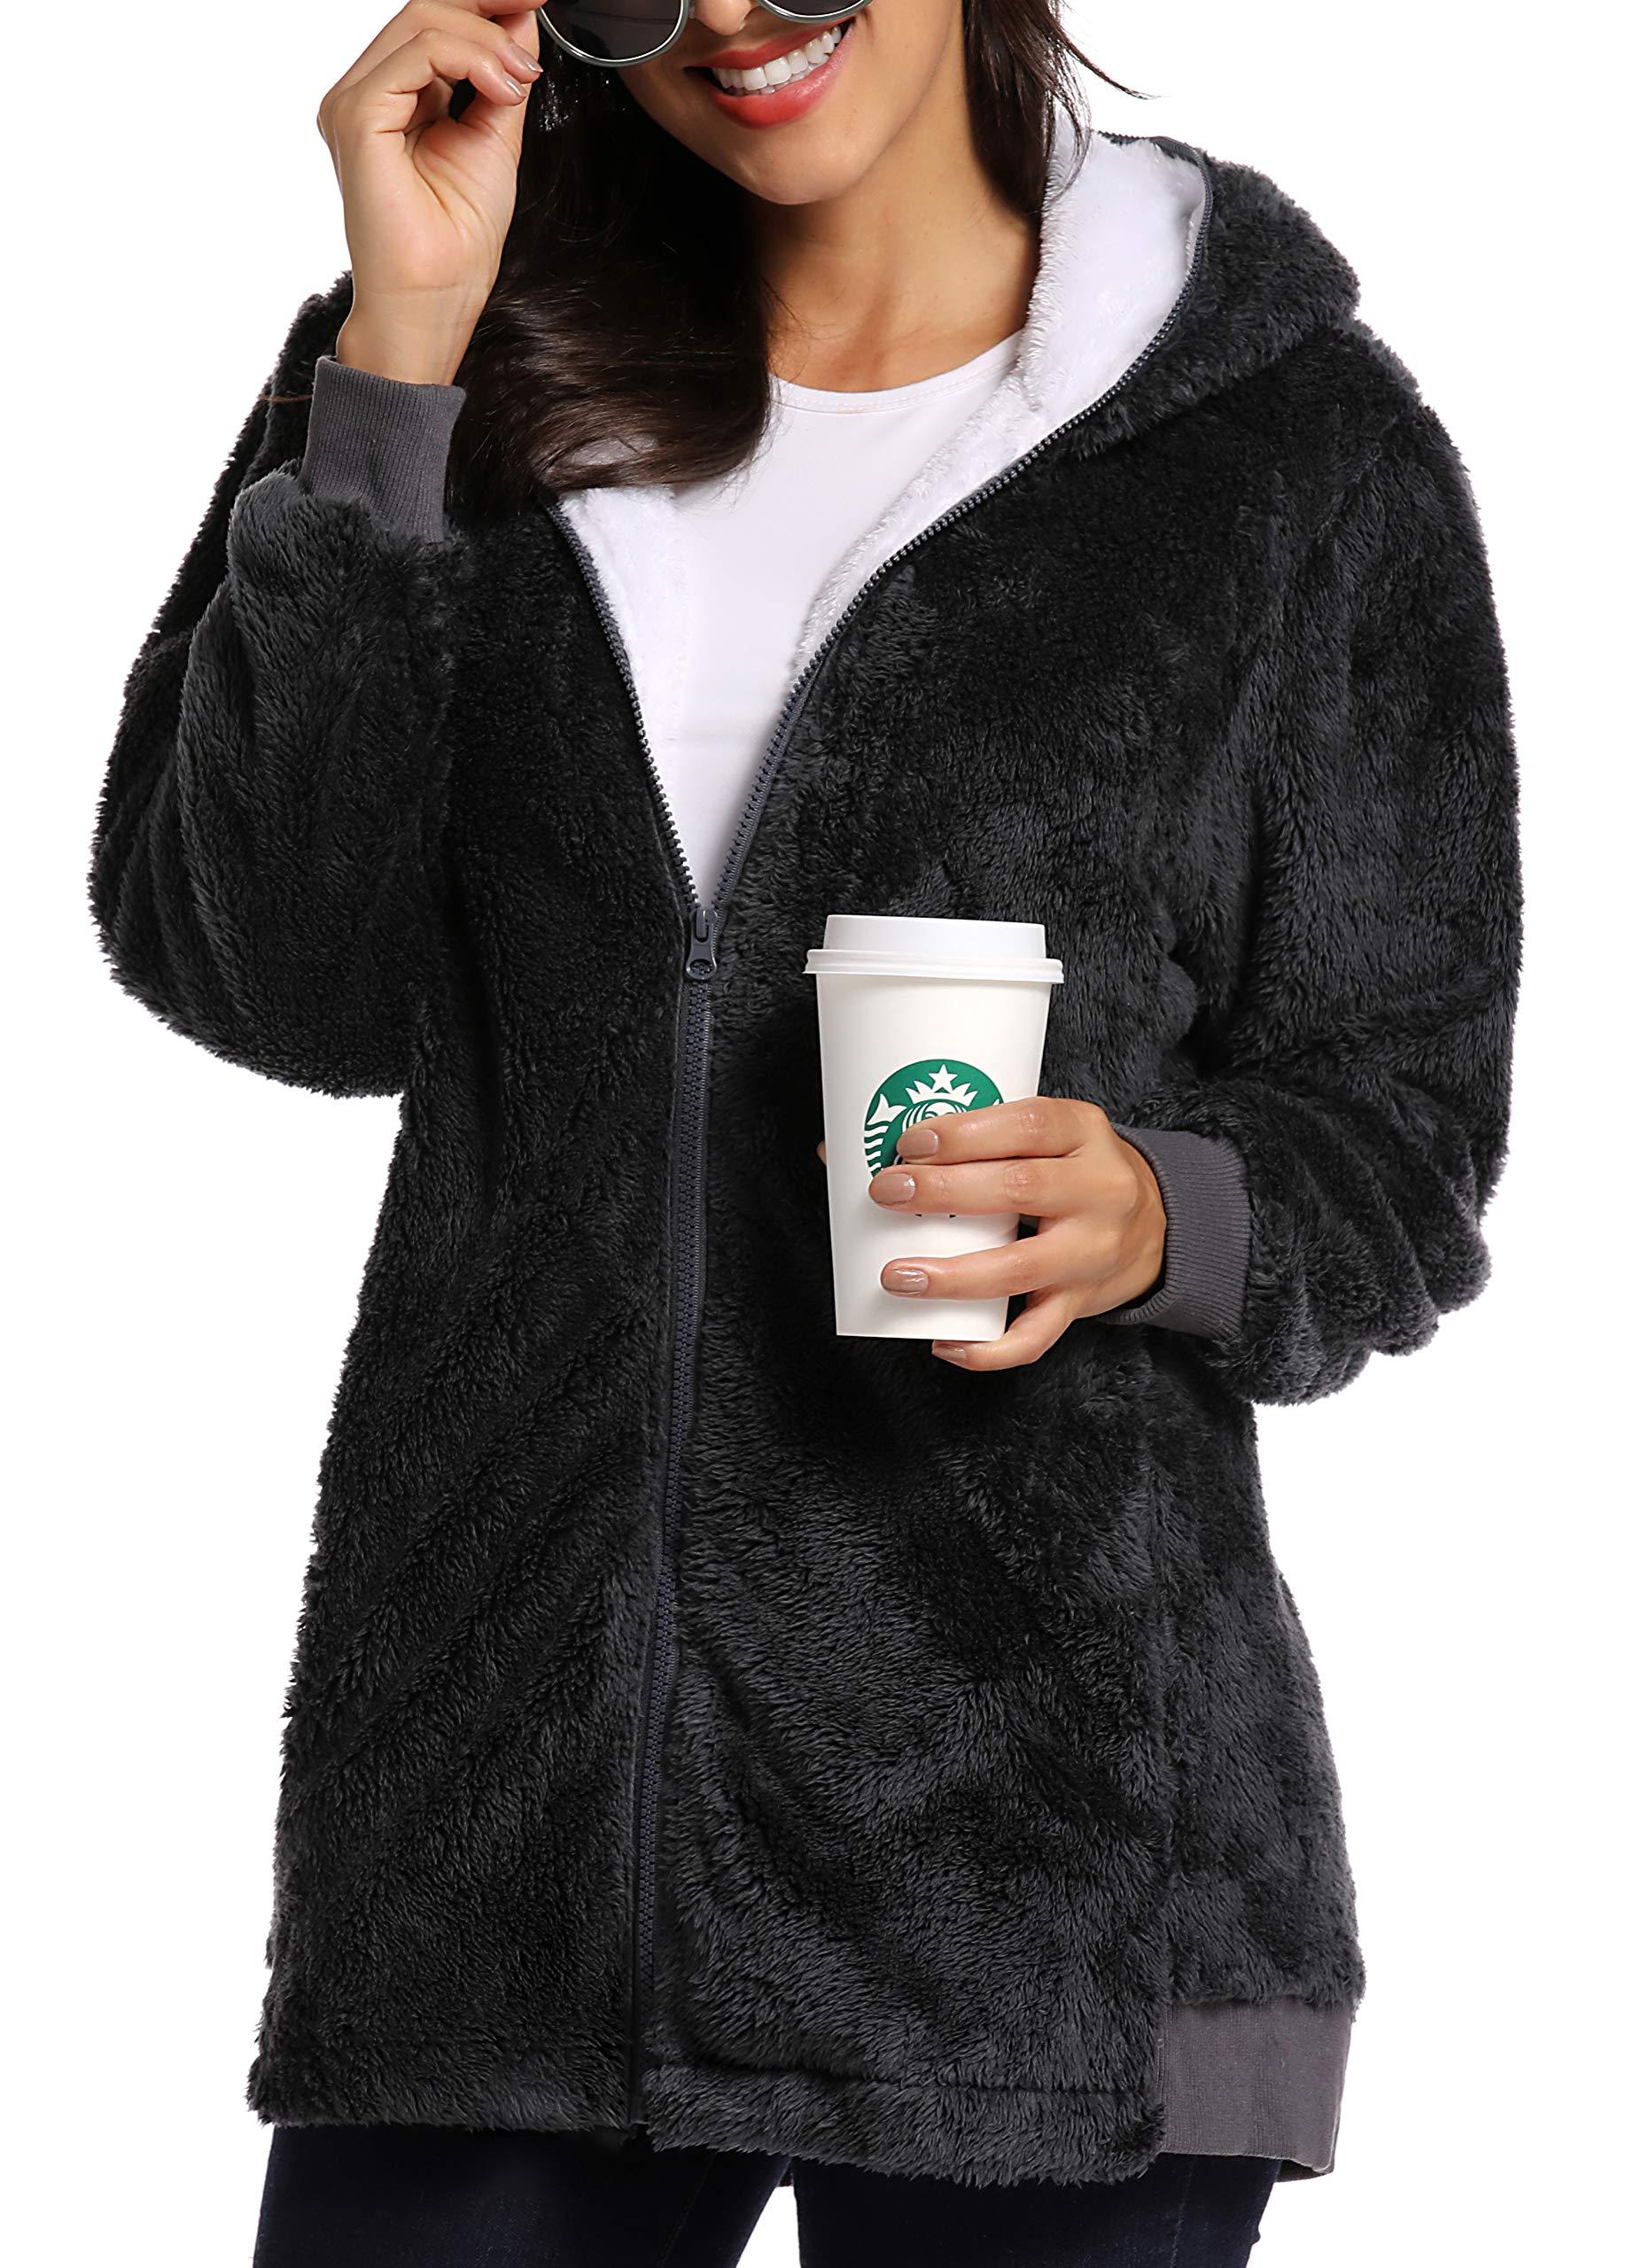 Caissip Fleece Coat for Women,Women's Oversized Zip Up Hooded Jacket Winter Plus Size Sherpa Coat Darkgrey by Caissip